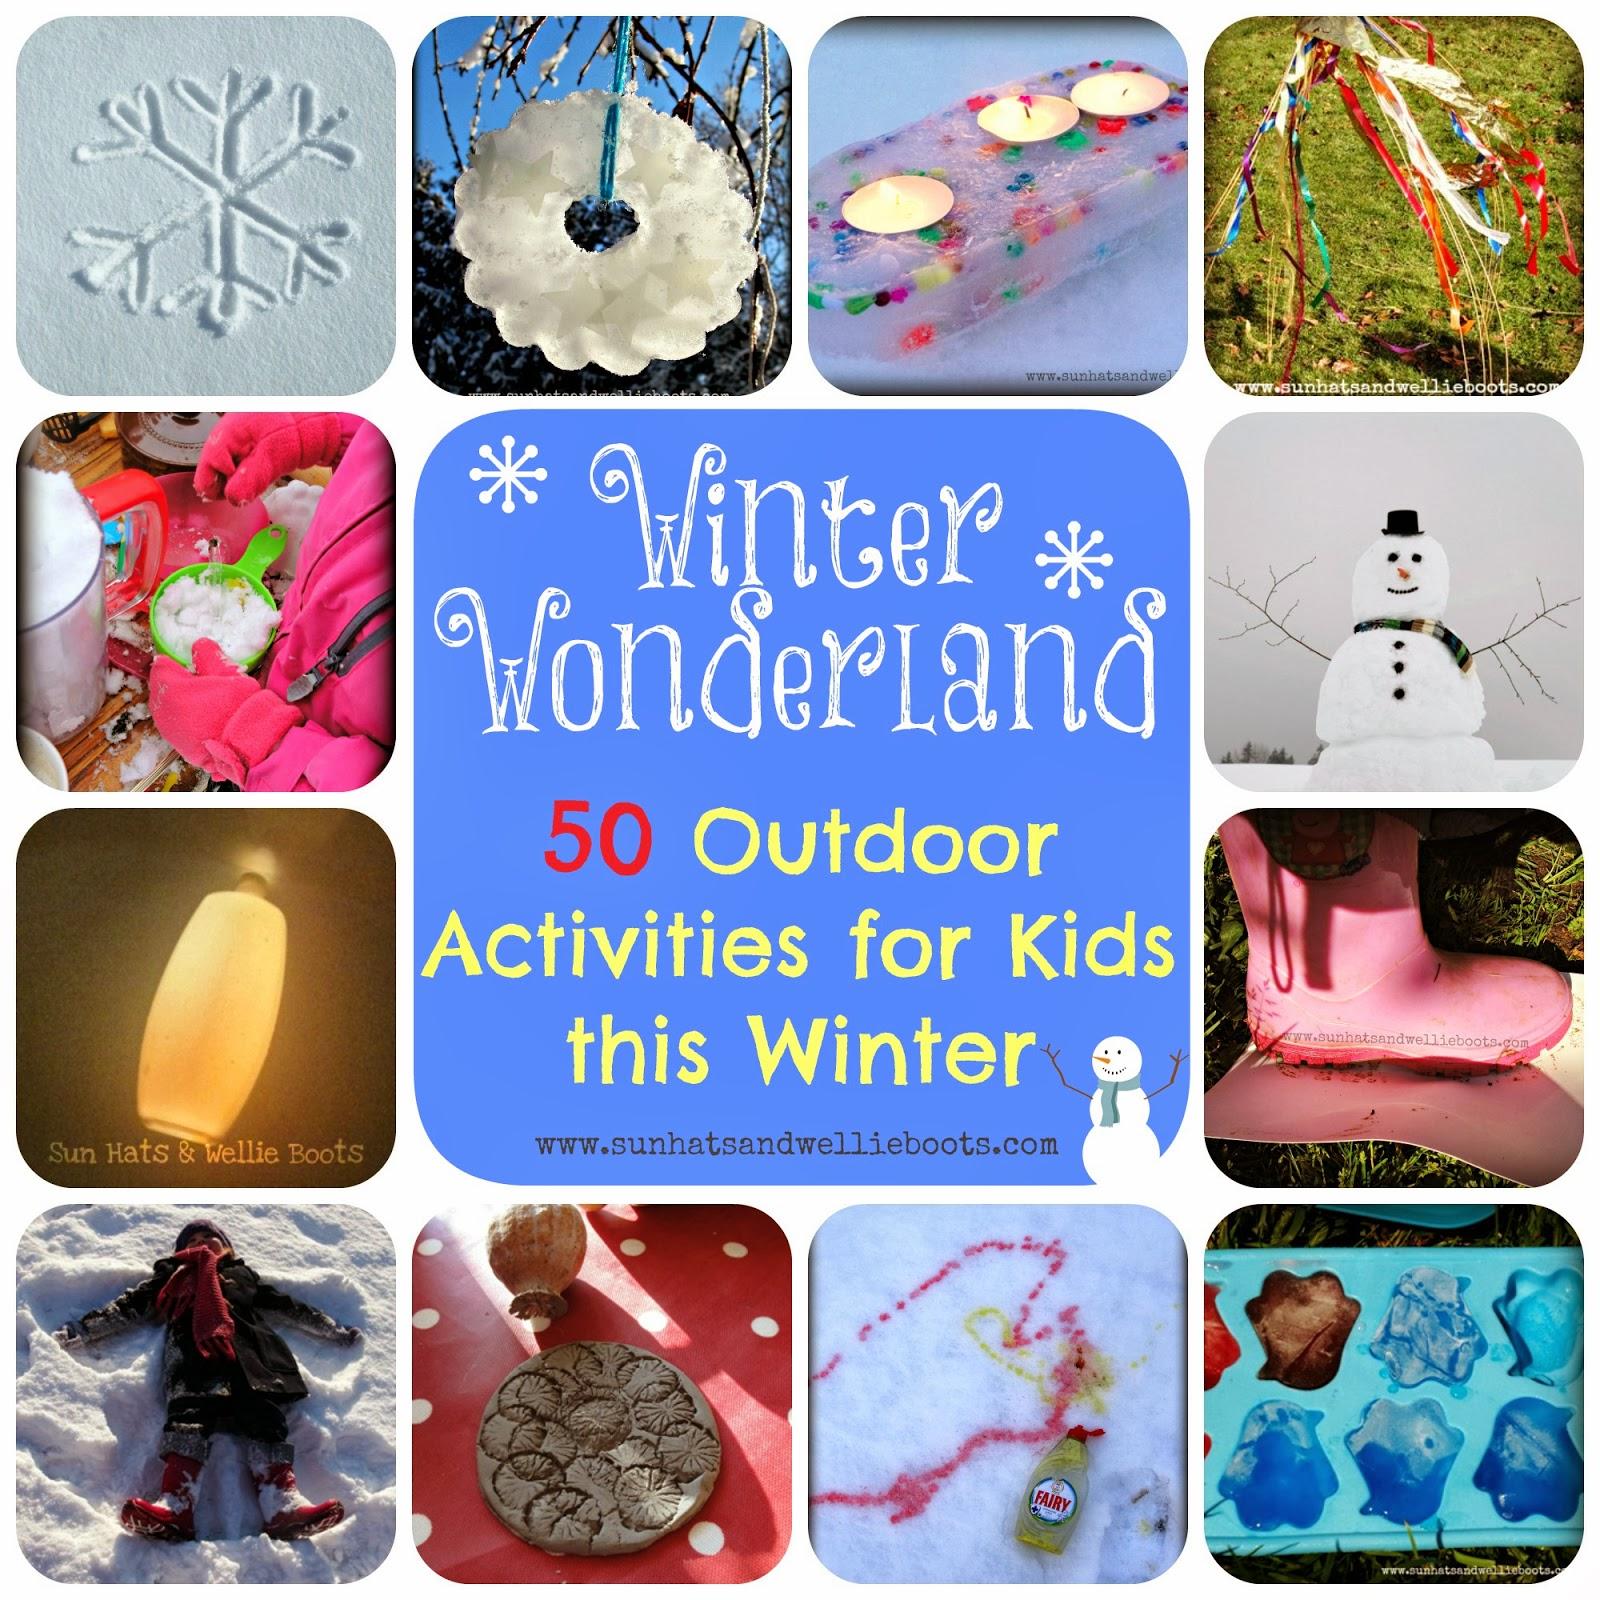 Sun Hats & Wellie Boots 50 Outdoor Activities for Kids this Winter